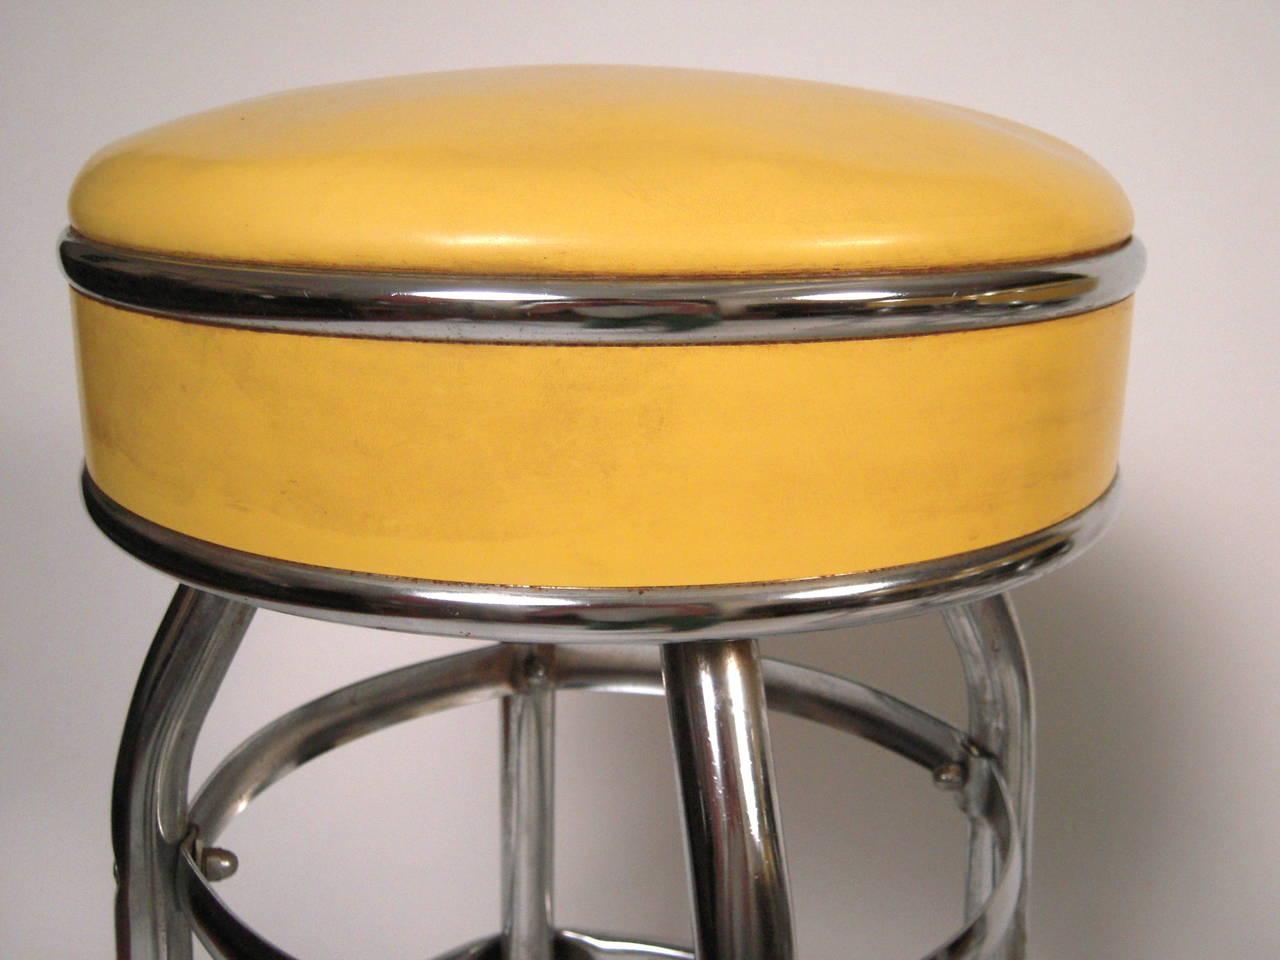 Set Of 4 1950s Metal And Yellow Swivel Bar Stools At 1stdibs